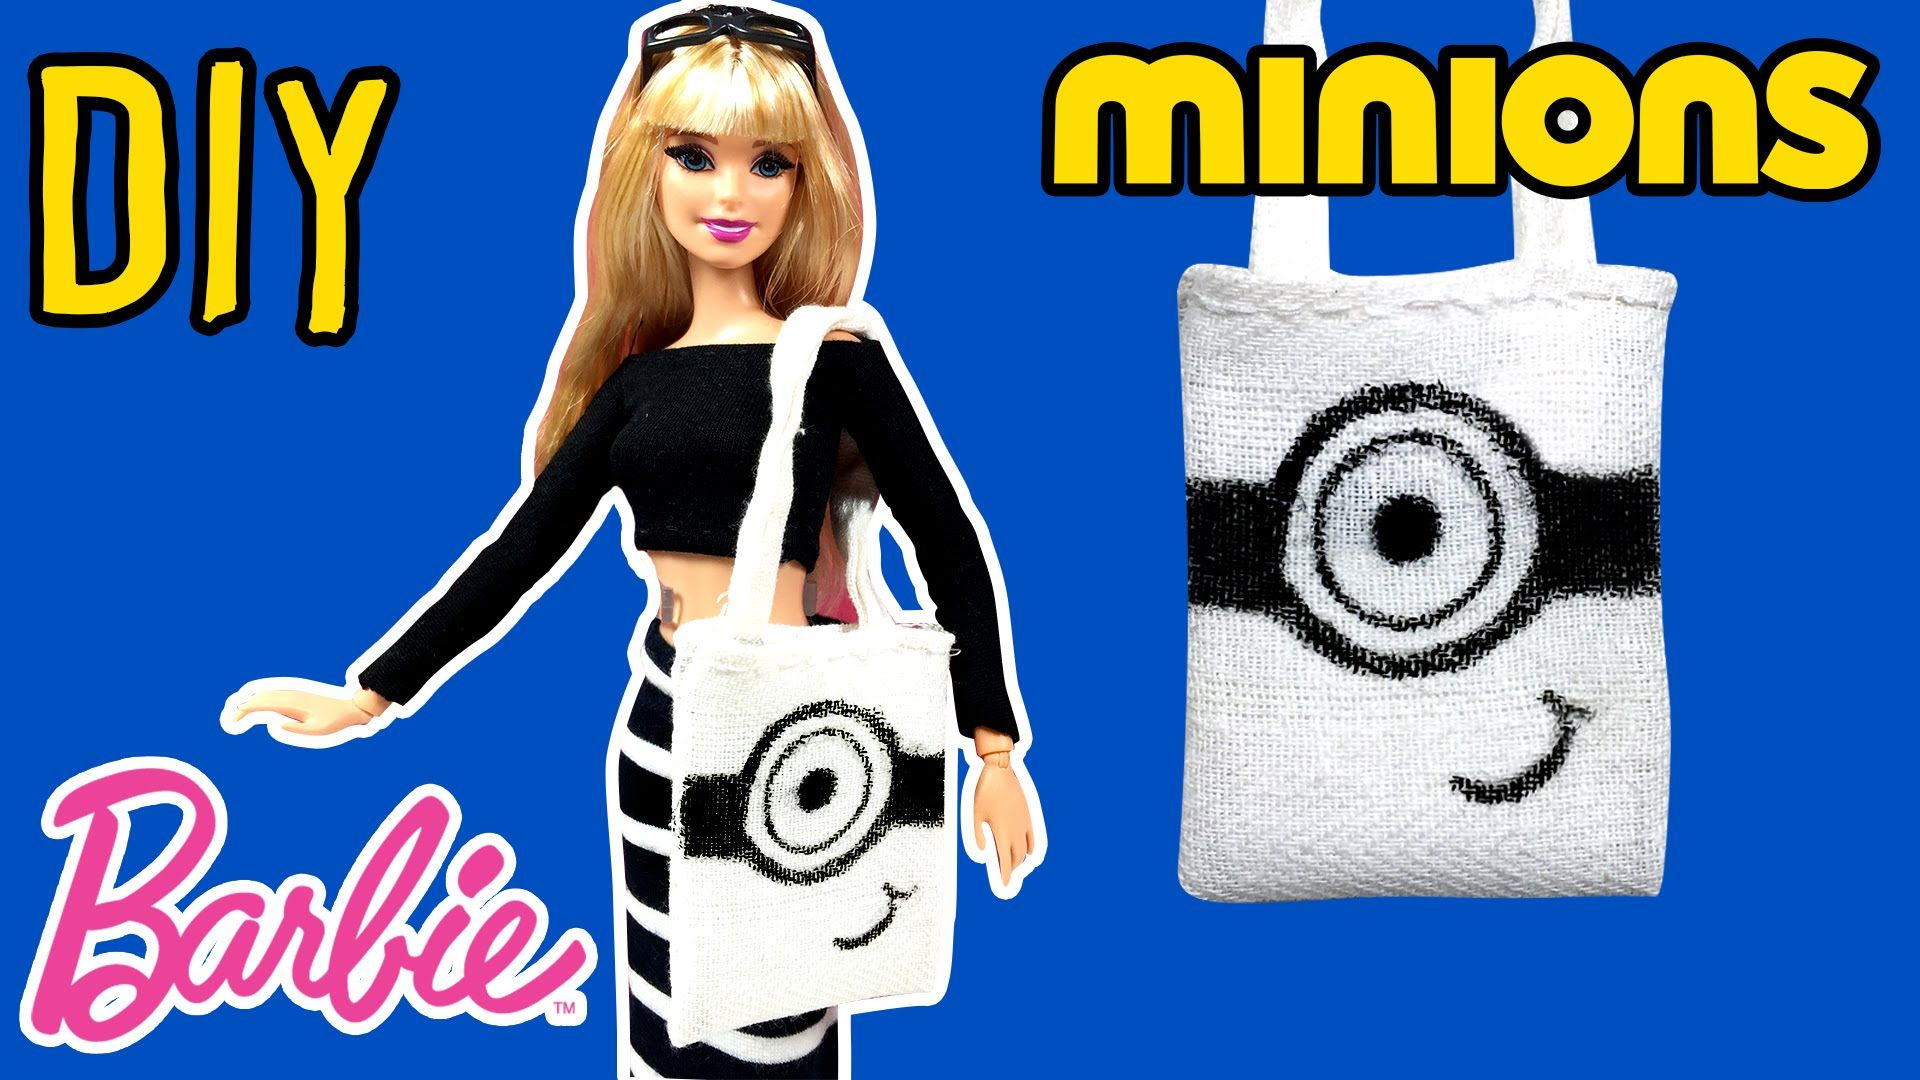 DIY How to Make Barbie Doll Minions Bag Barbie Tote Bag